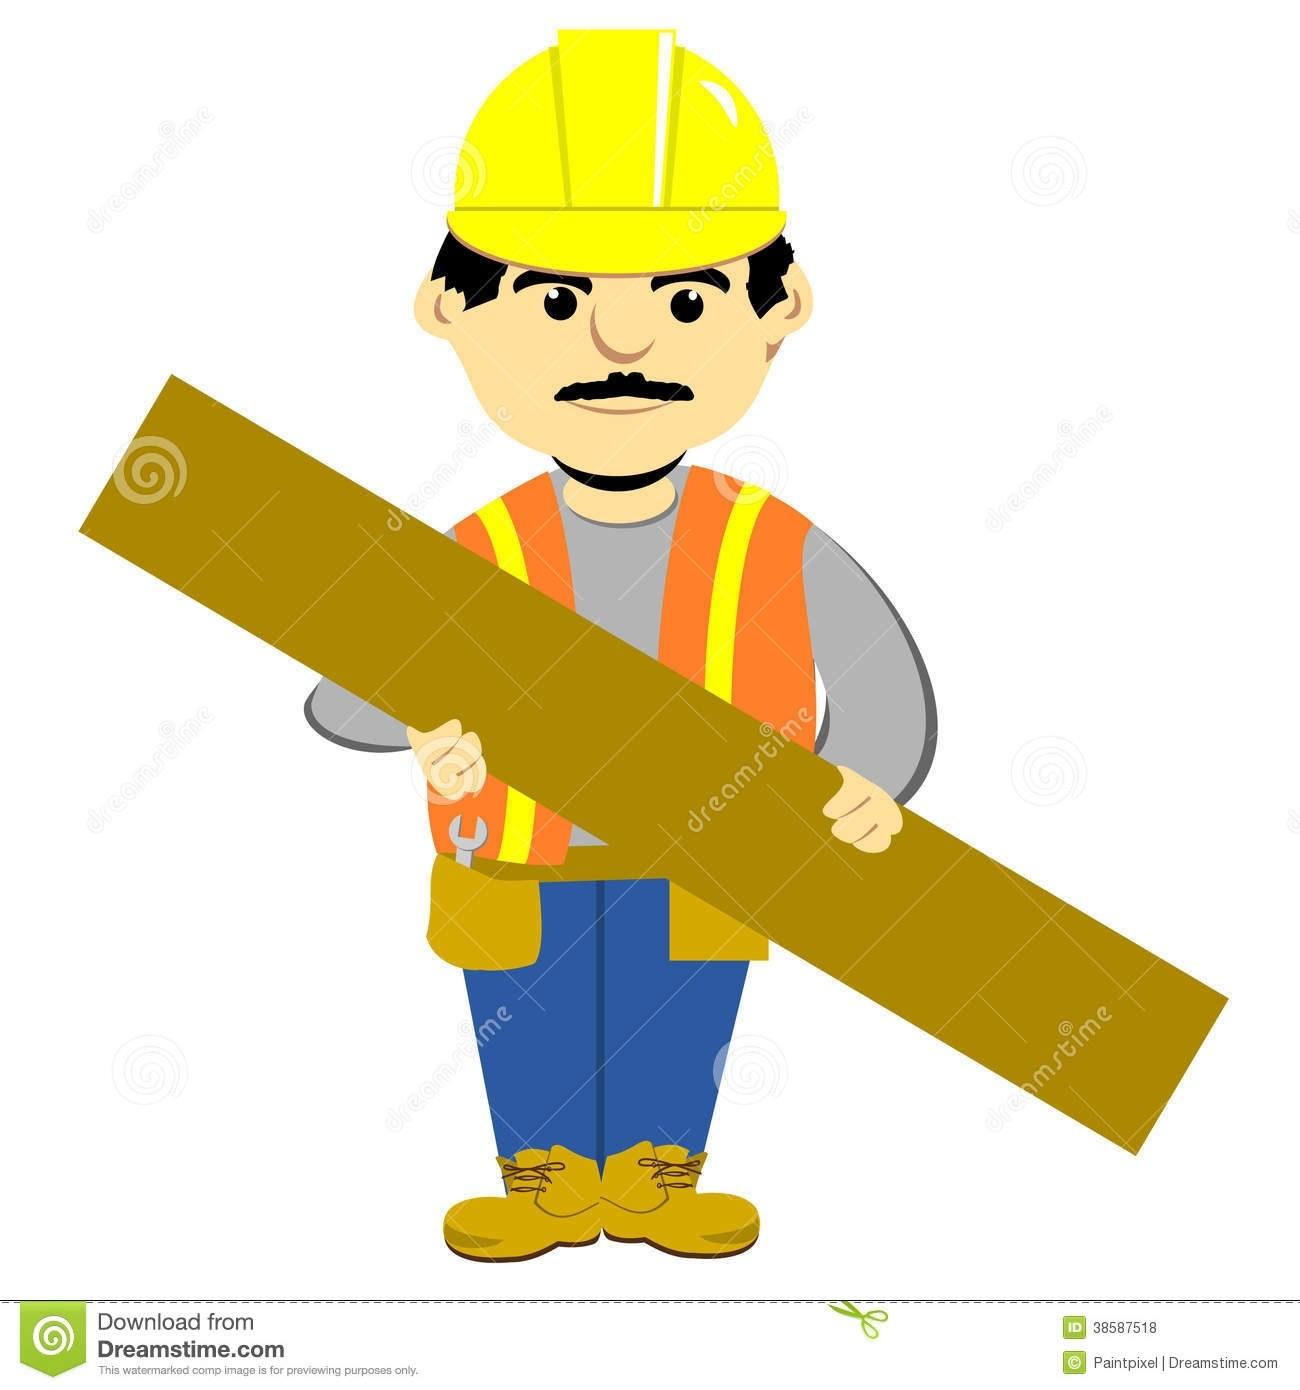 Construction worker clipart free jpg transparent download Construction worker cartoon clipart free 4 » Clipart Portal jpg transparent download